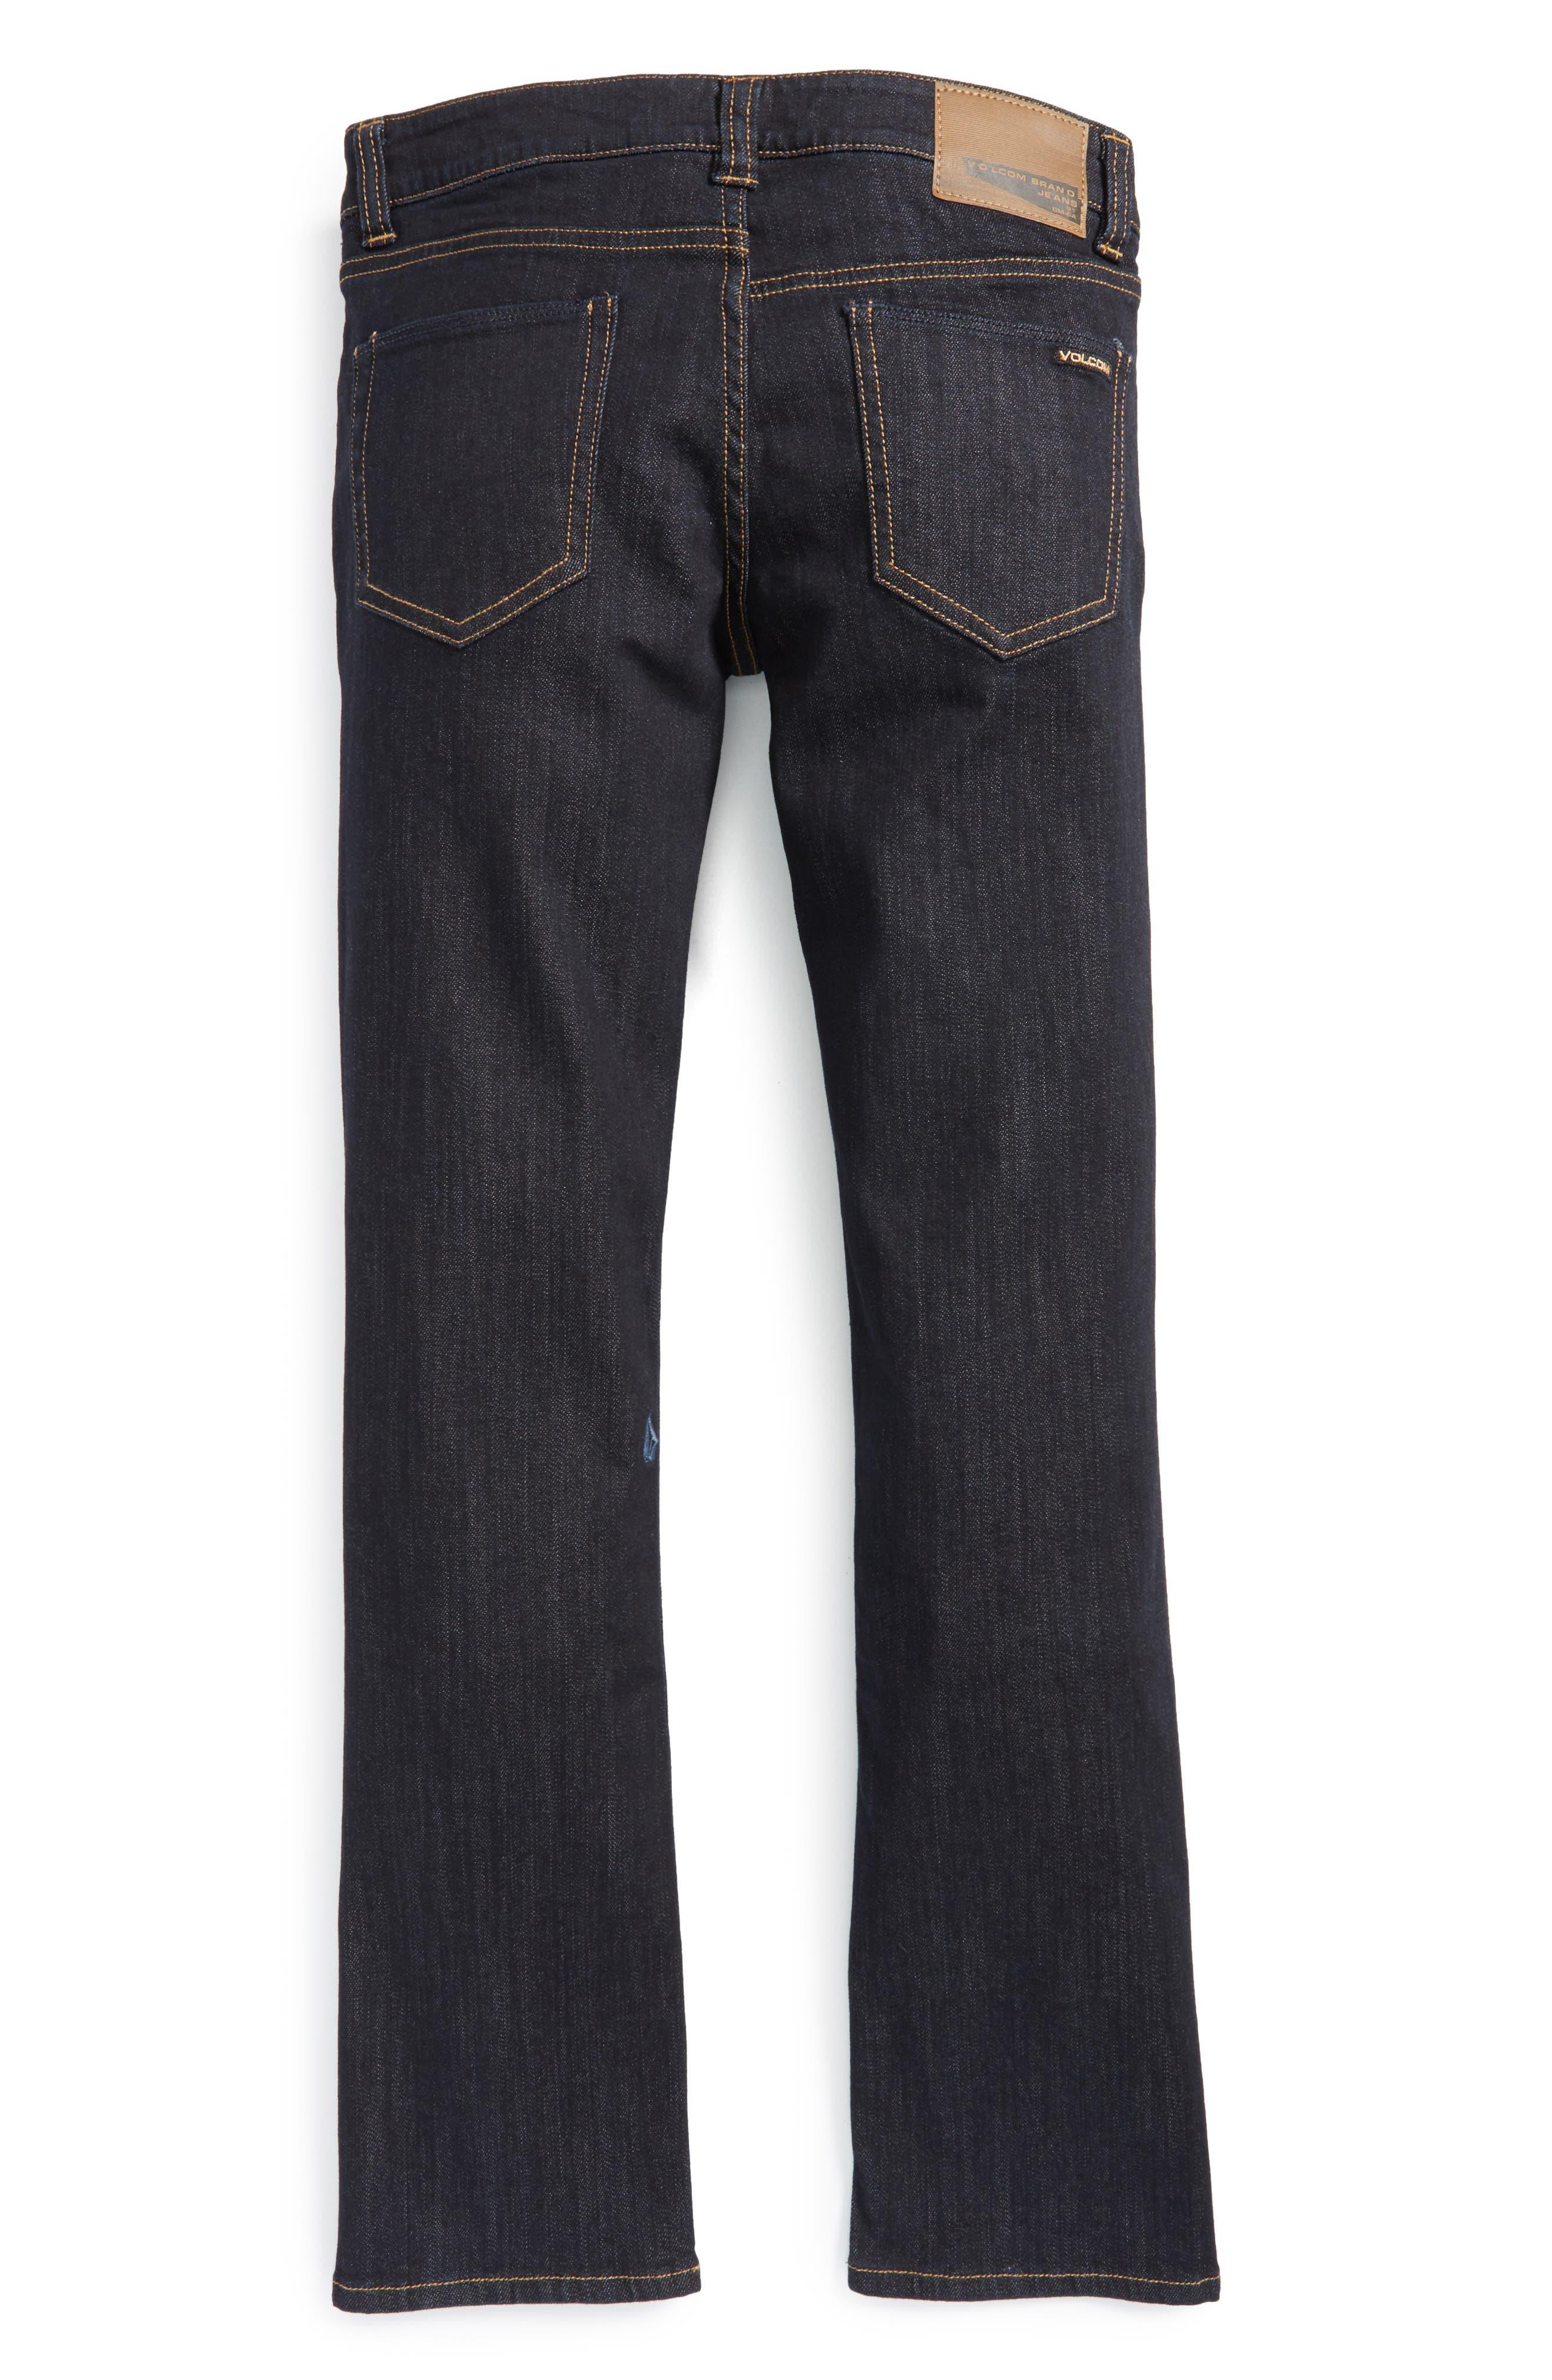 Vorta Slim Fit Jeans,                             Alternate thumbnail 3, color,                             BLUE RINSER